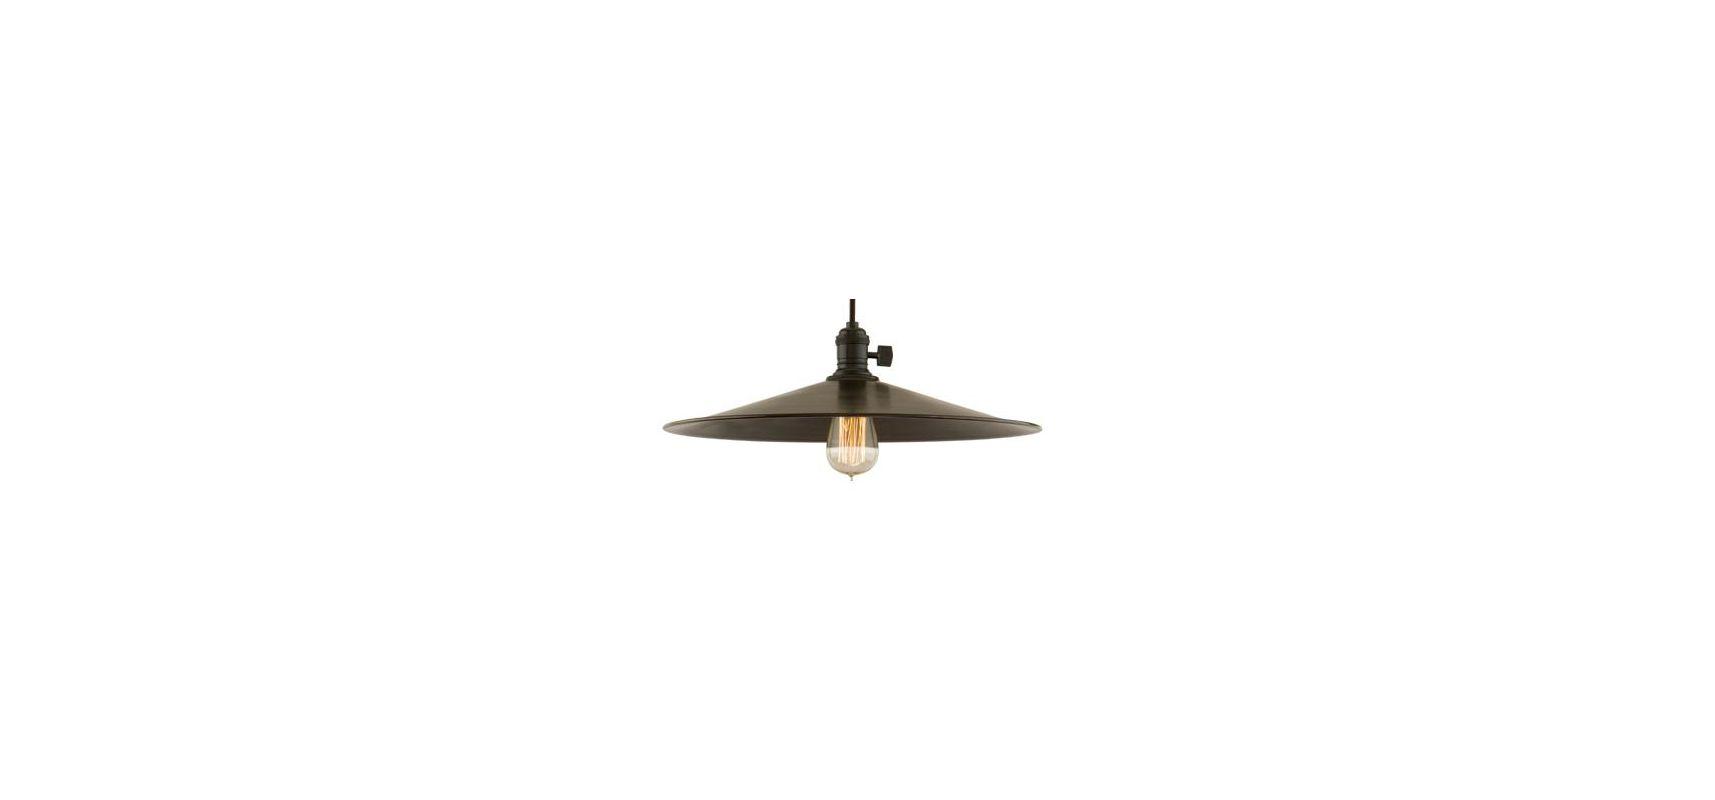 Hudson Valley 8001-OB-MM1 Bronze Industrial Heirloom Pendant